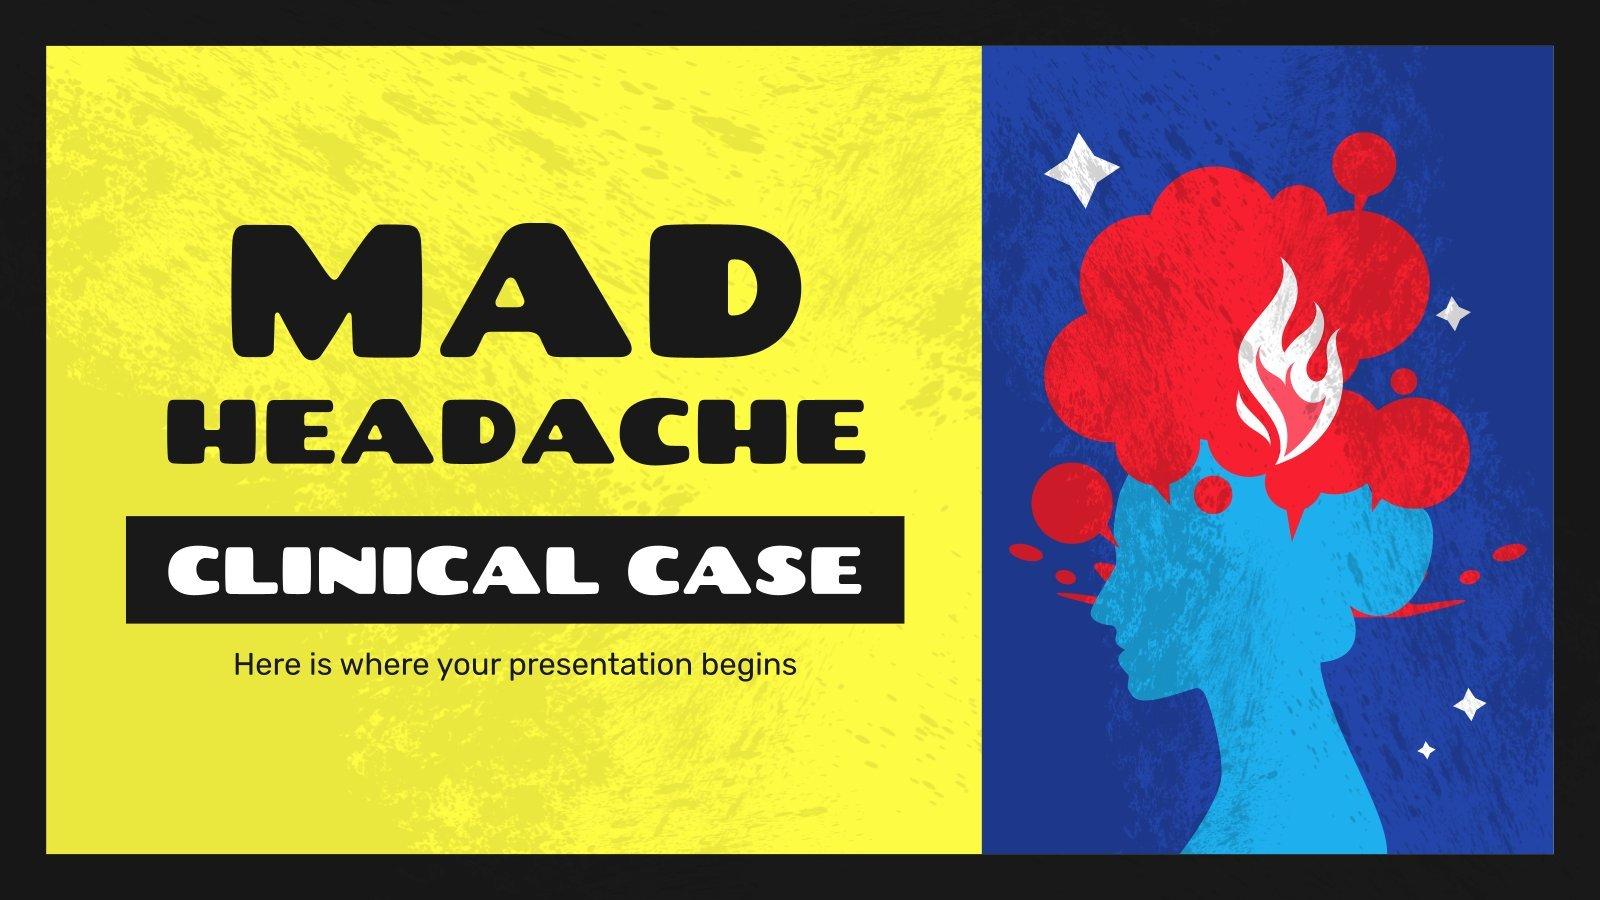 Mad Headache Clinical Case presentation template